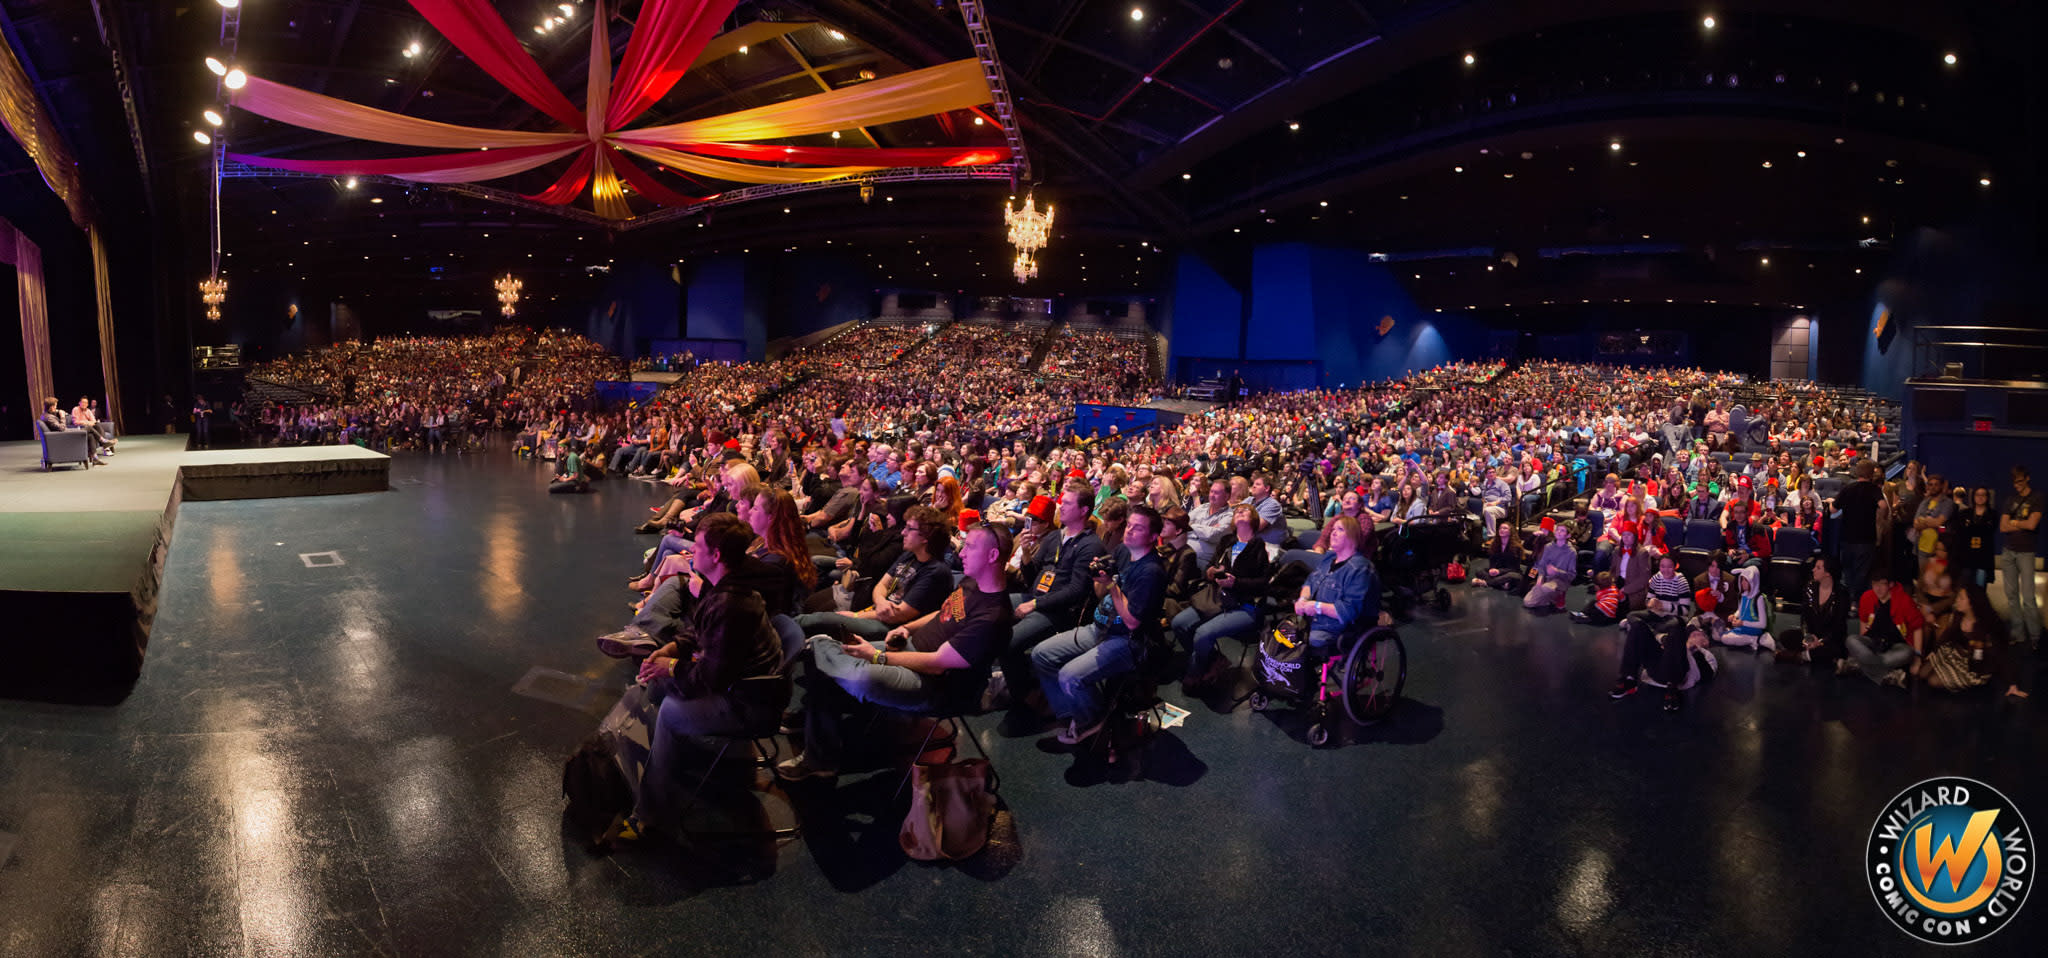 Wizard World Comic Con stage